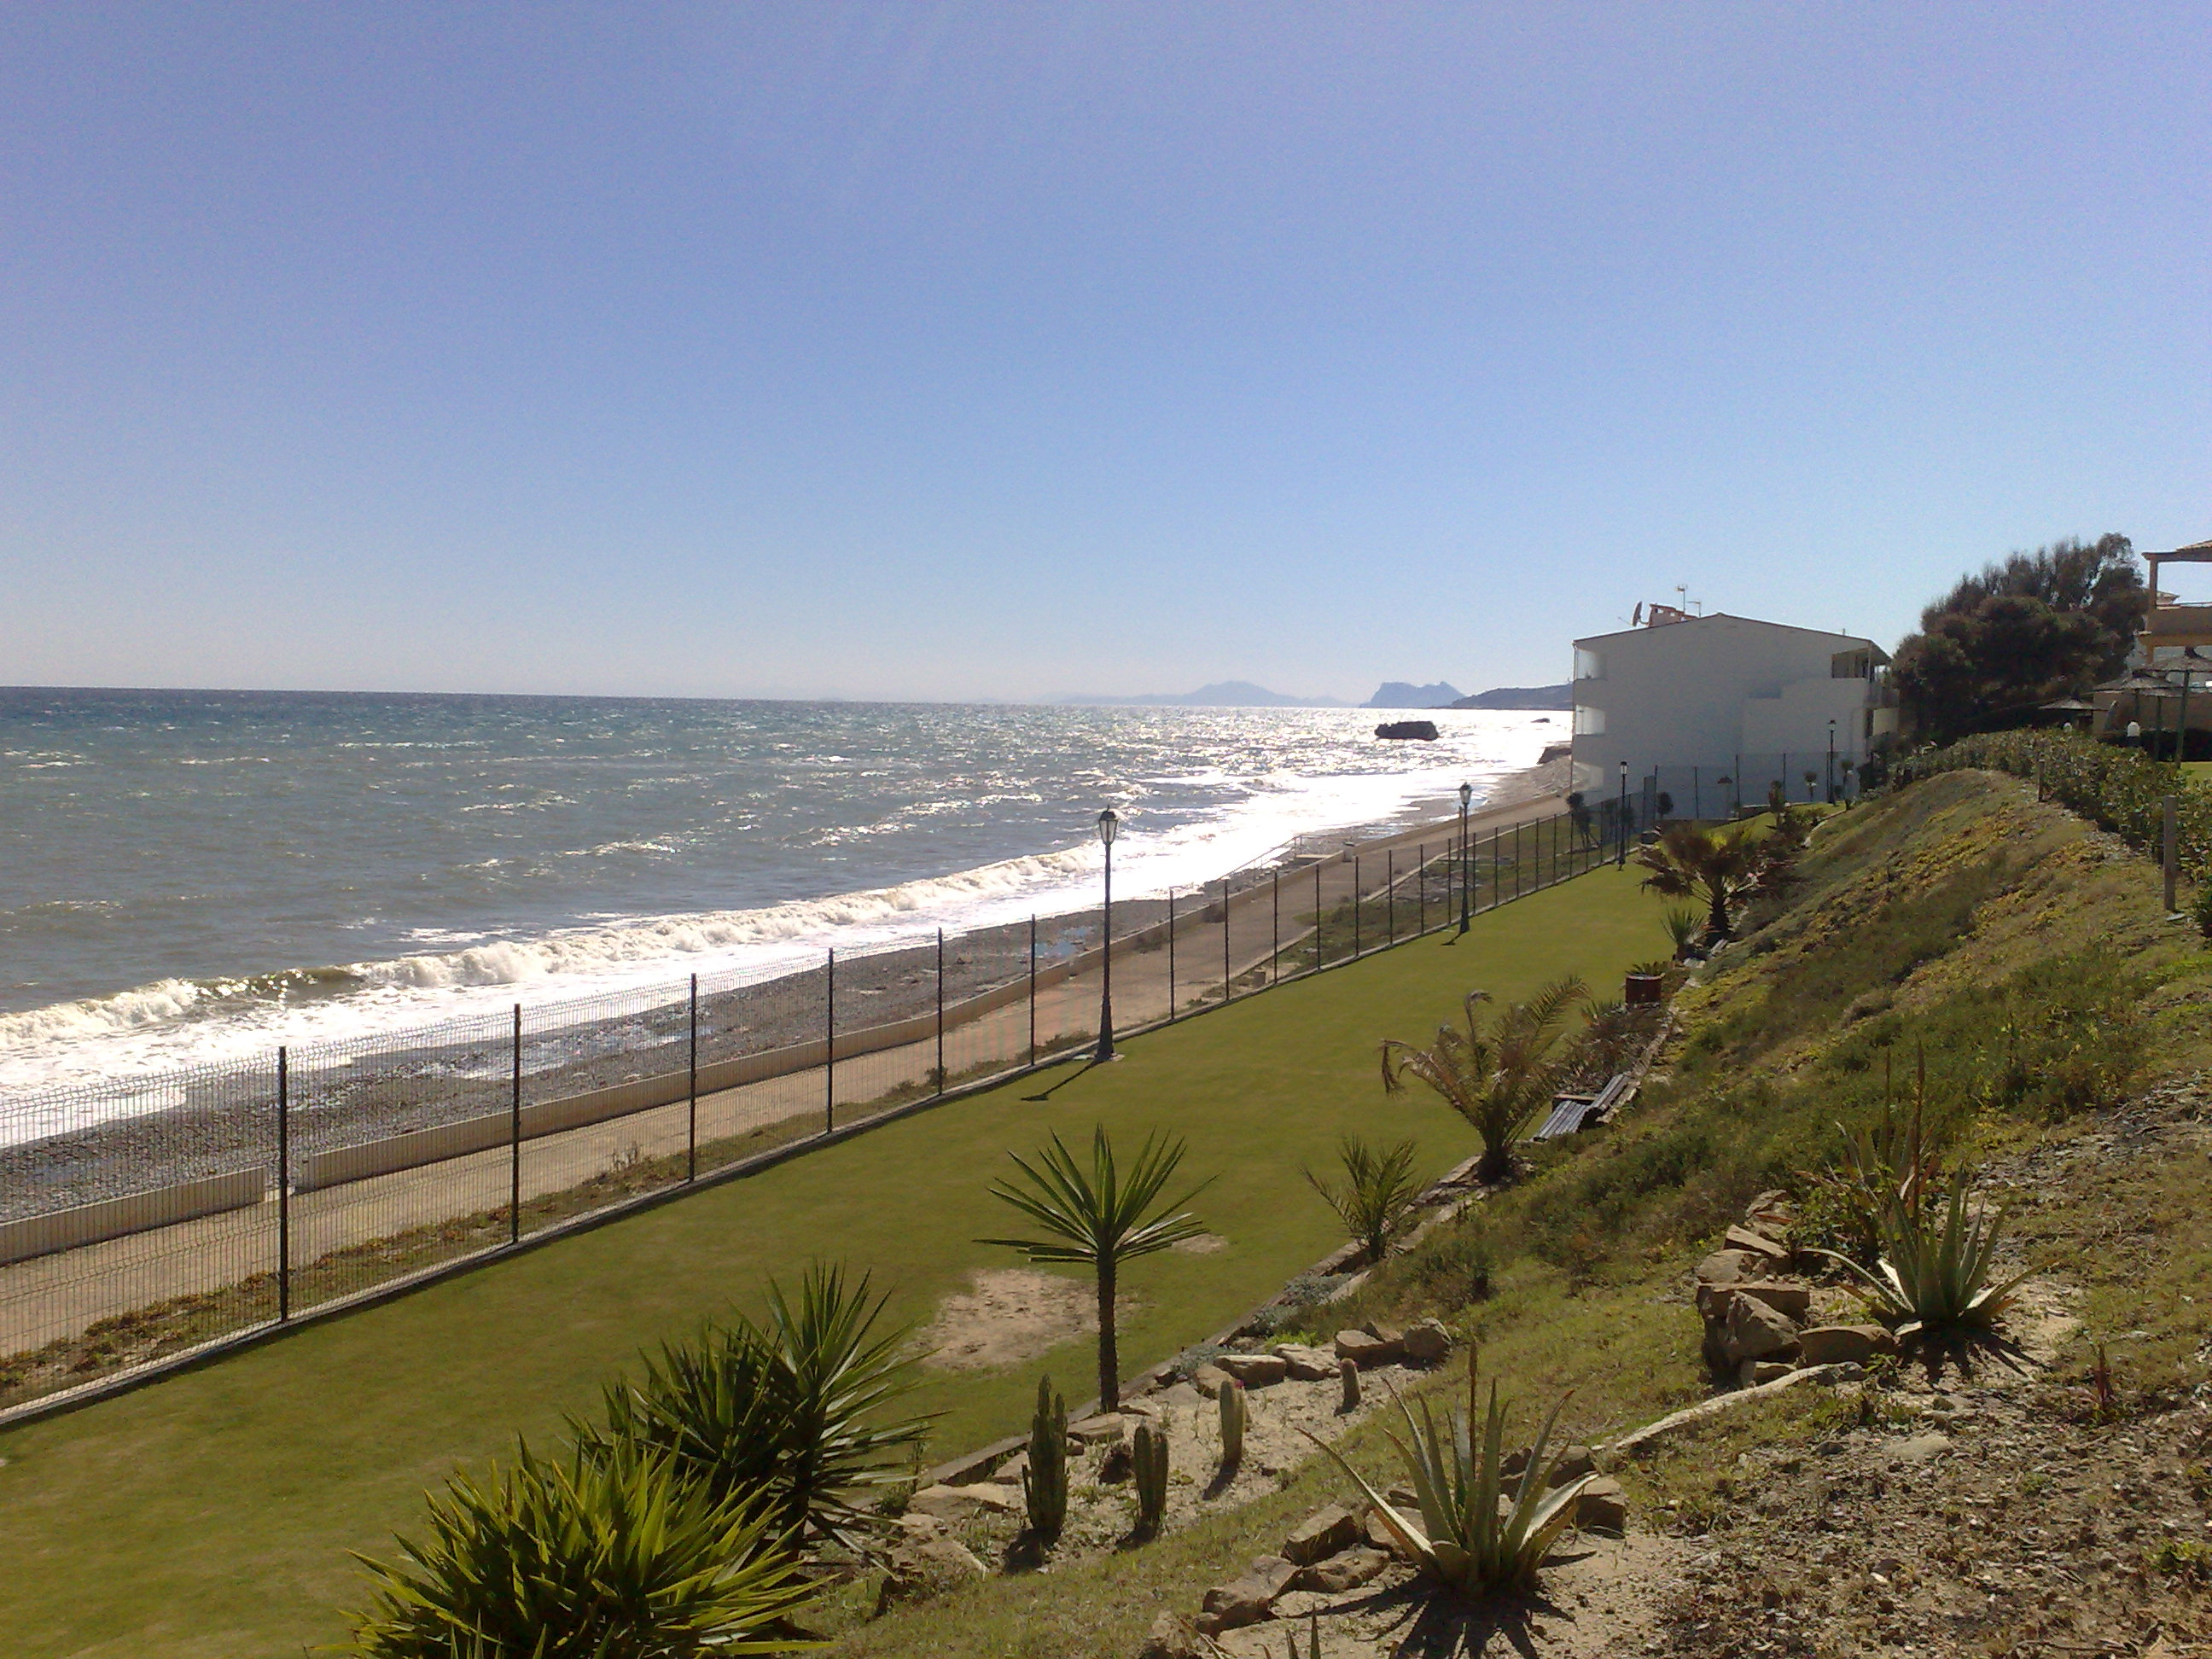 Foto playa Bahía Dorada. Gib and Africa from Bermuda Beach, Estepona, Spain